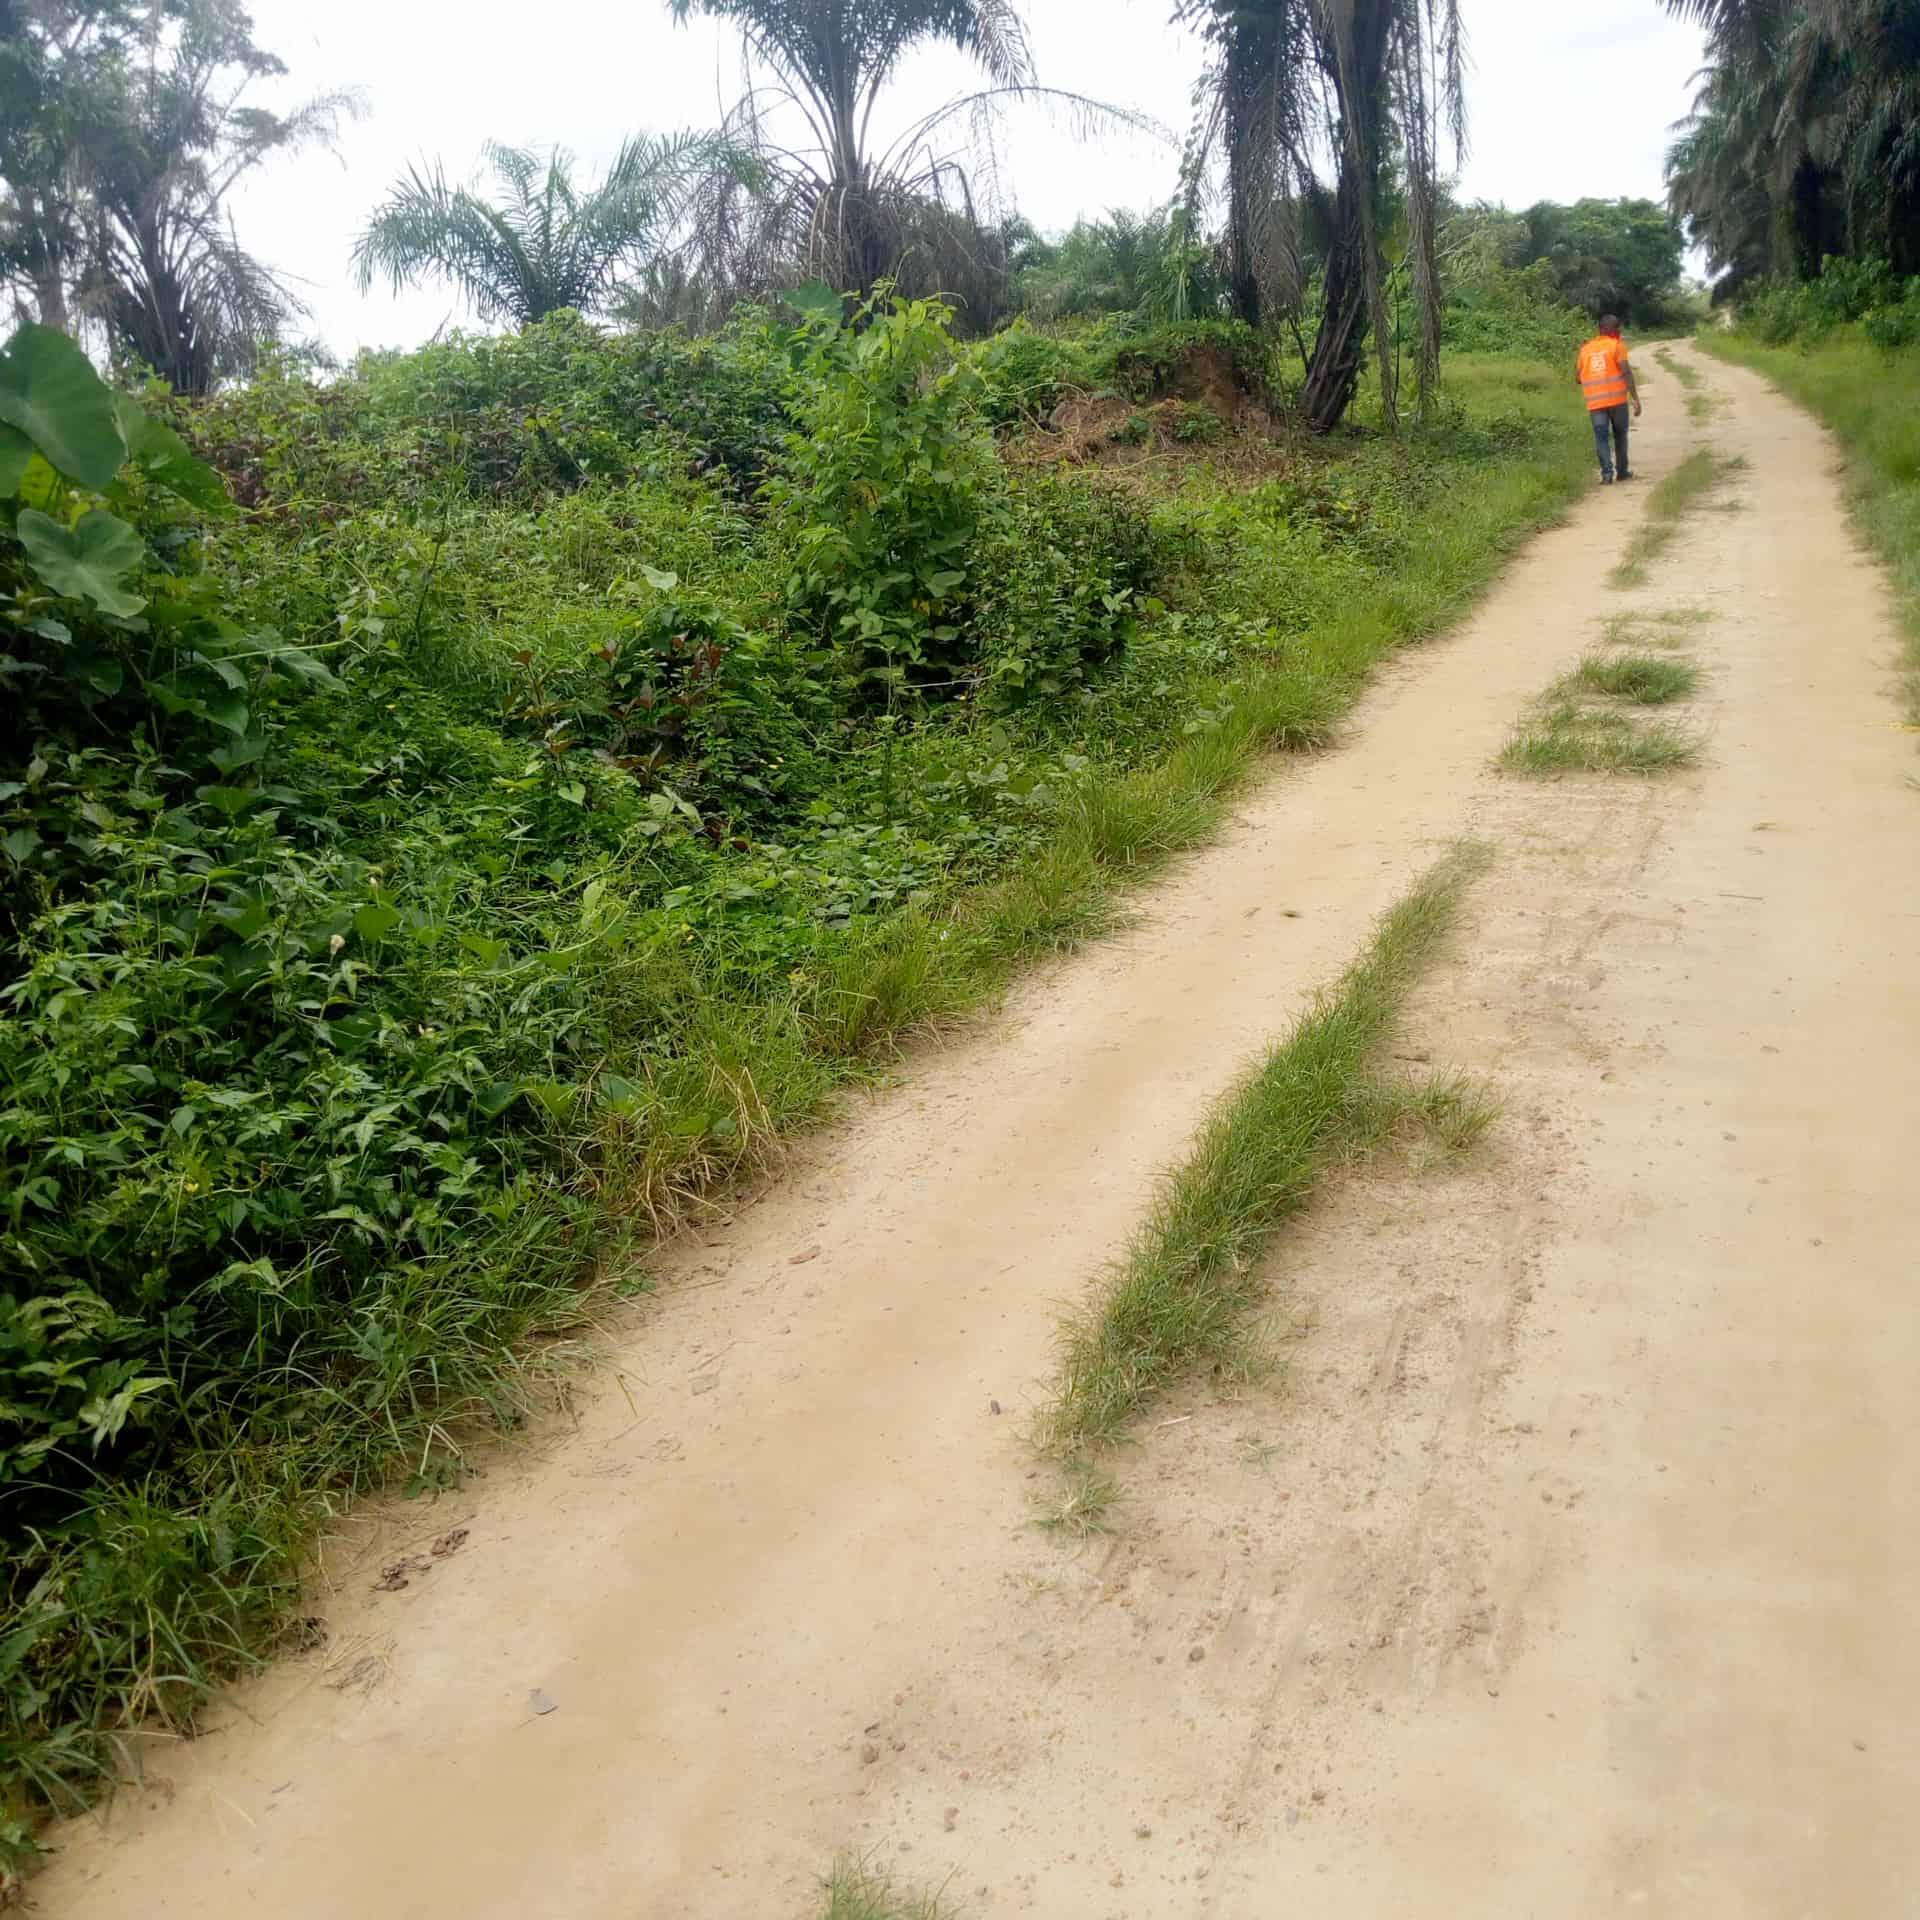 Land for sale at Douala, PK 21, Massoumbou 10km du goudron - 20000 m2 - 50 000 000 FCFA